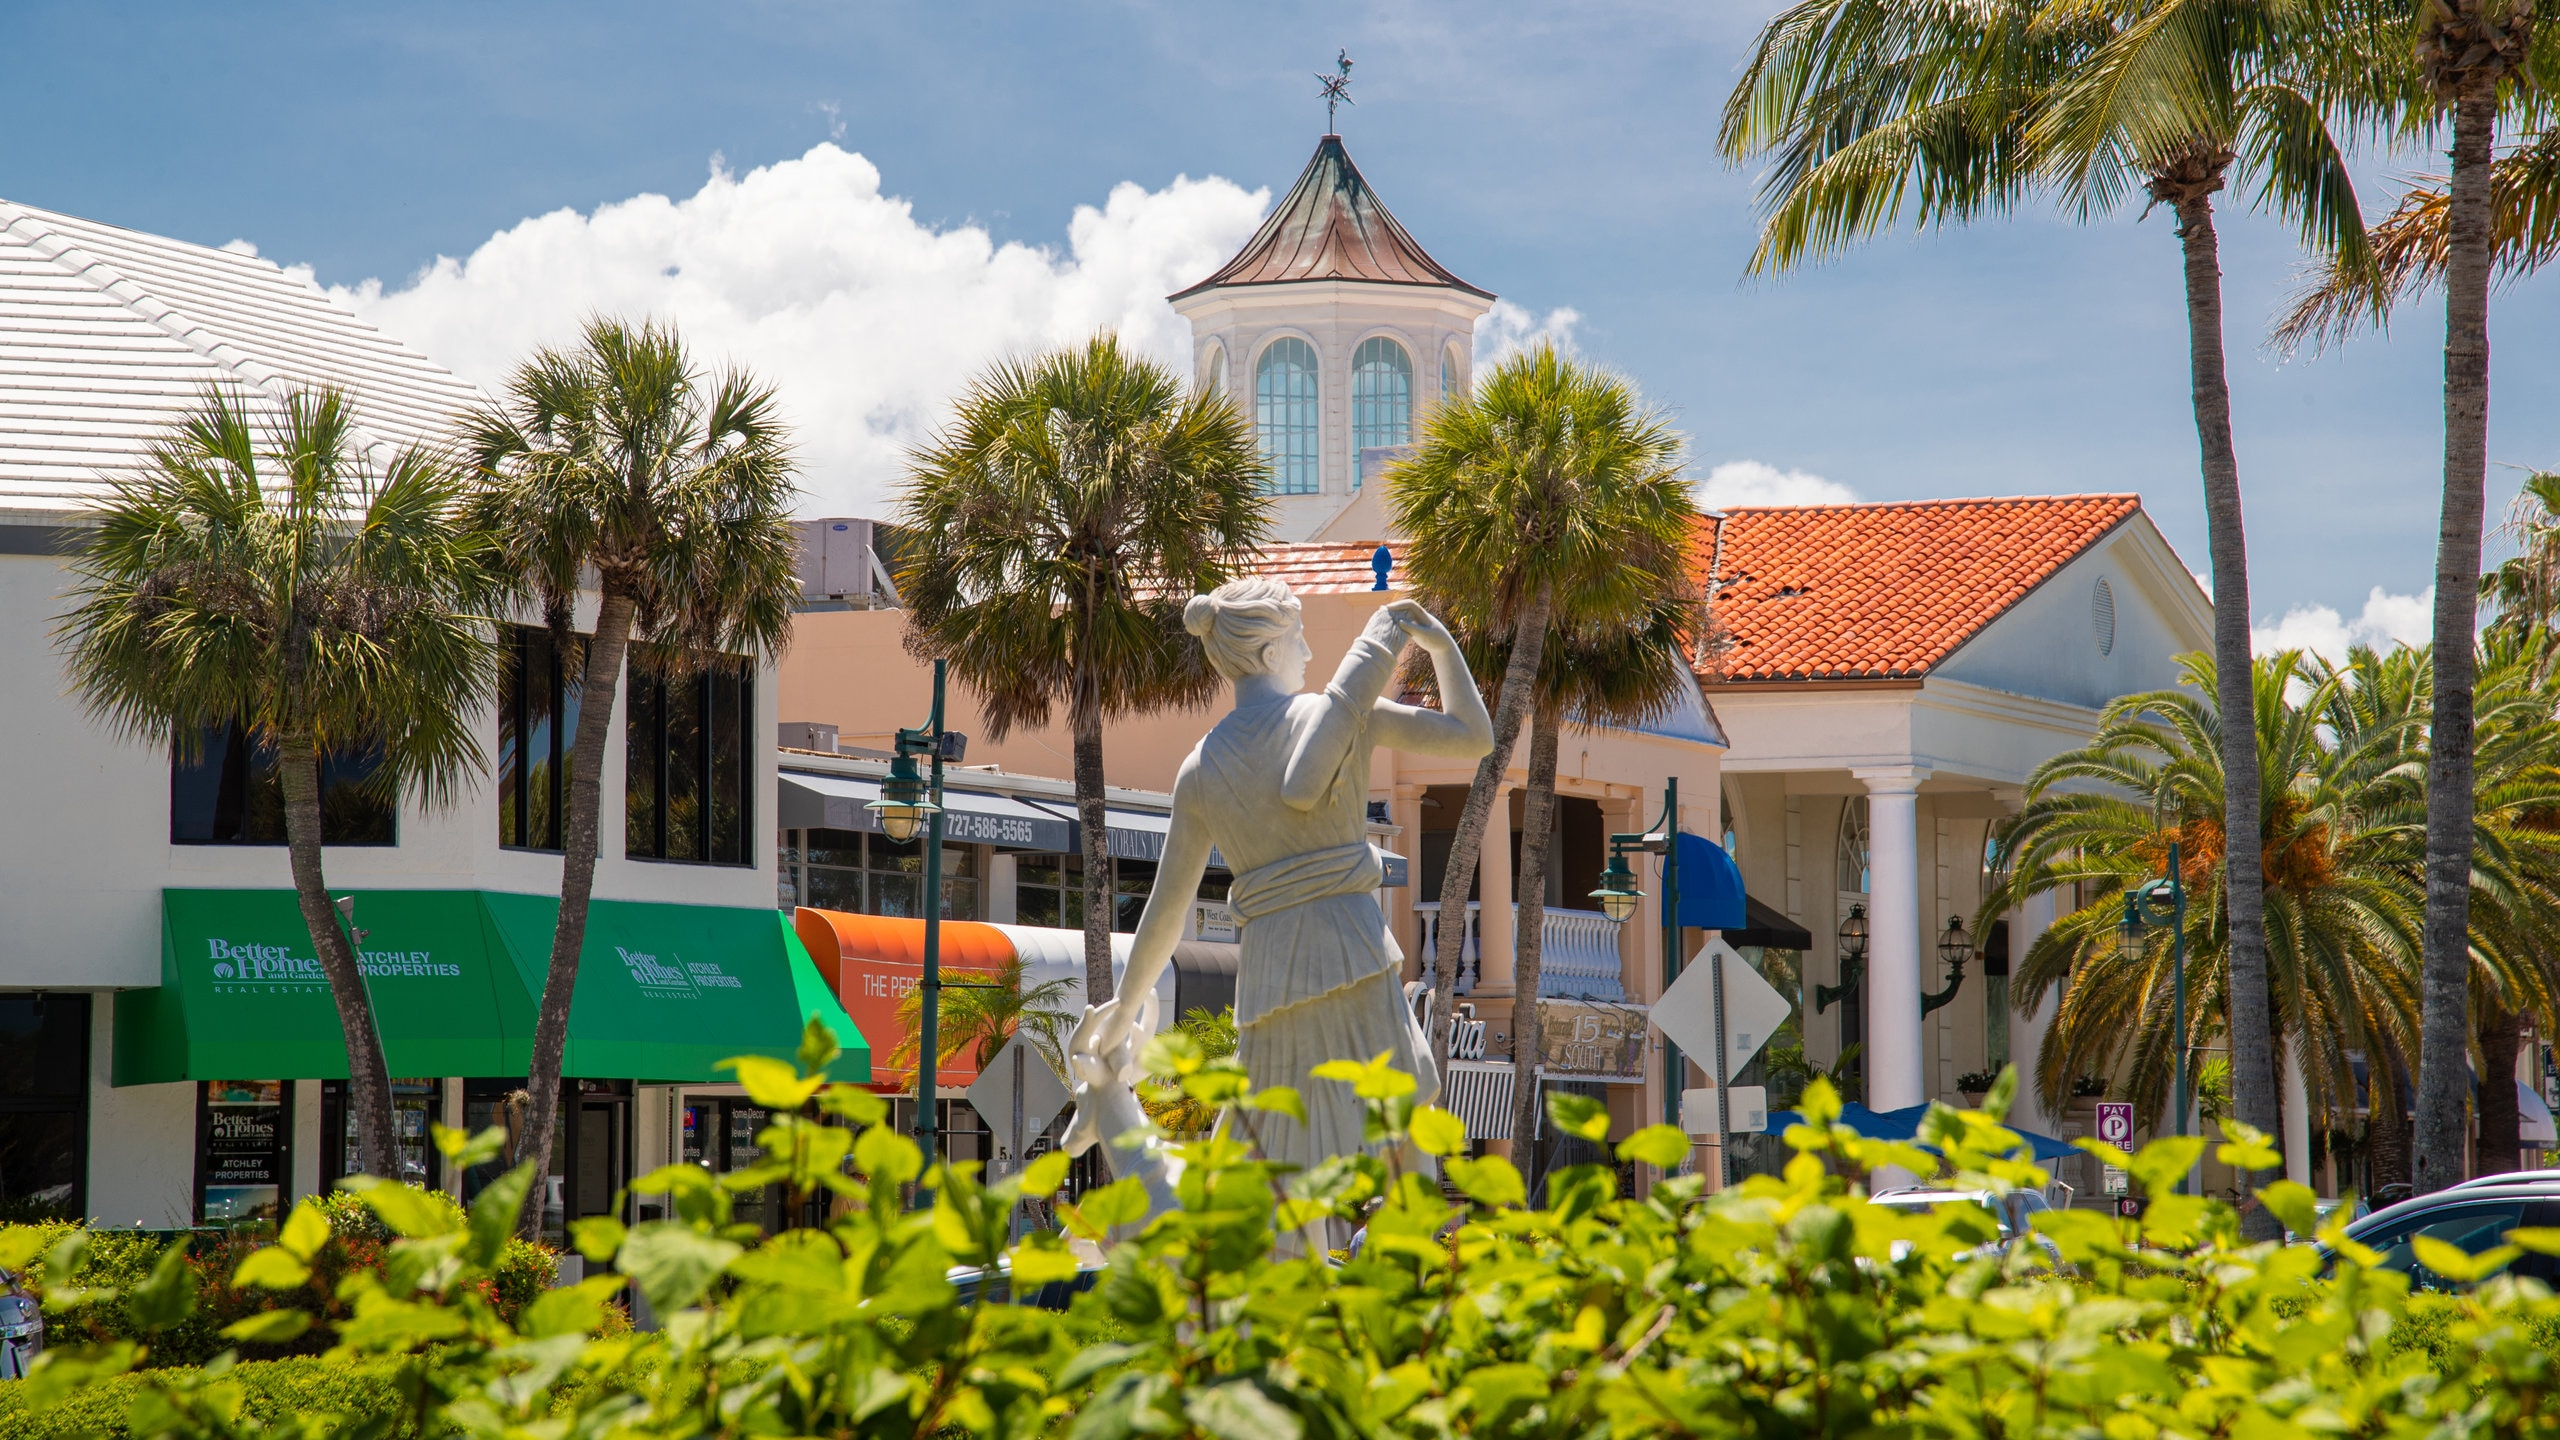 St. Armand's Key, Sarasota, Florida, USA